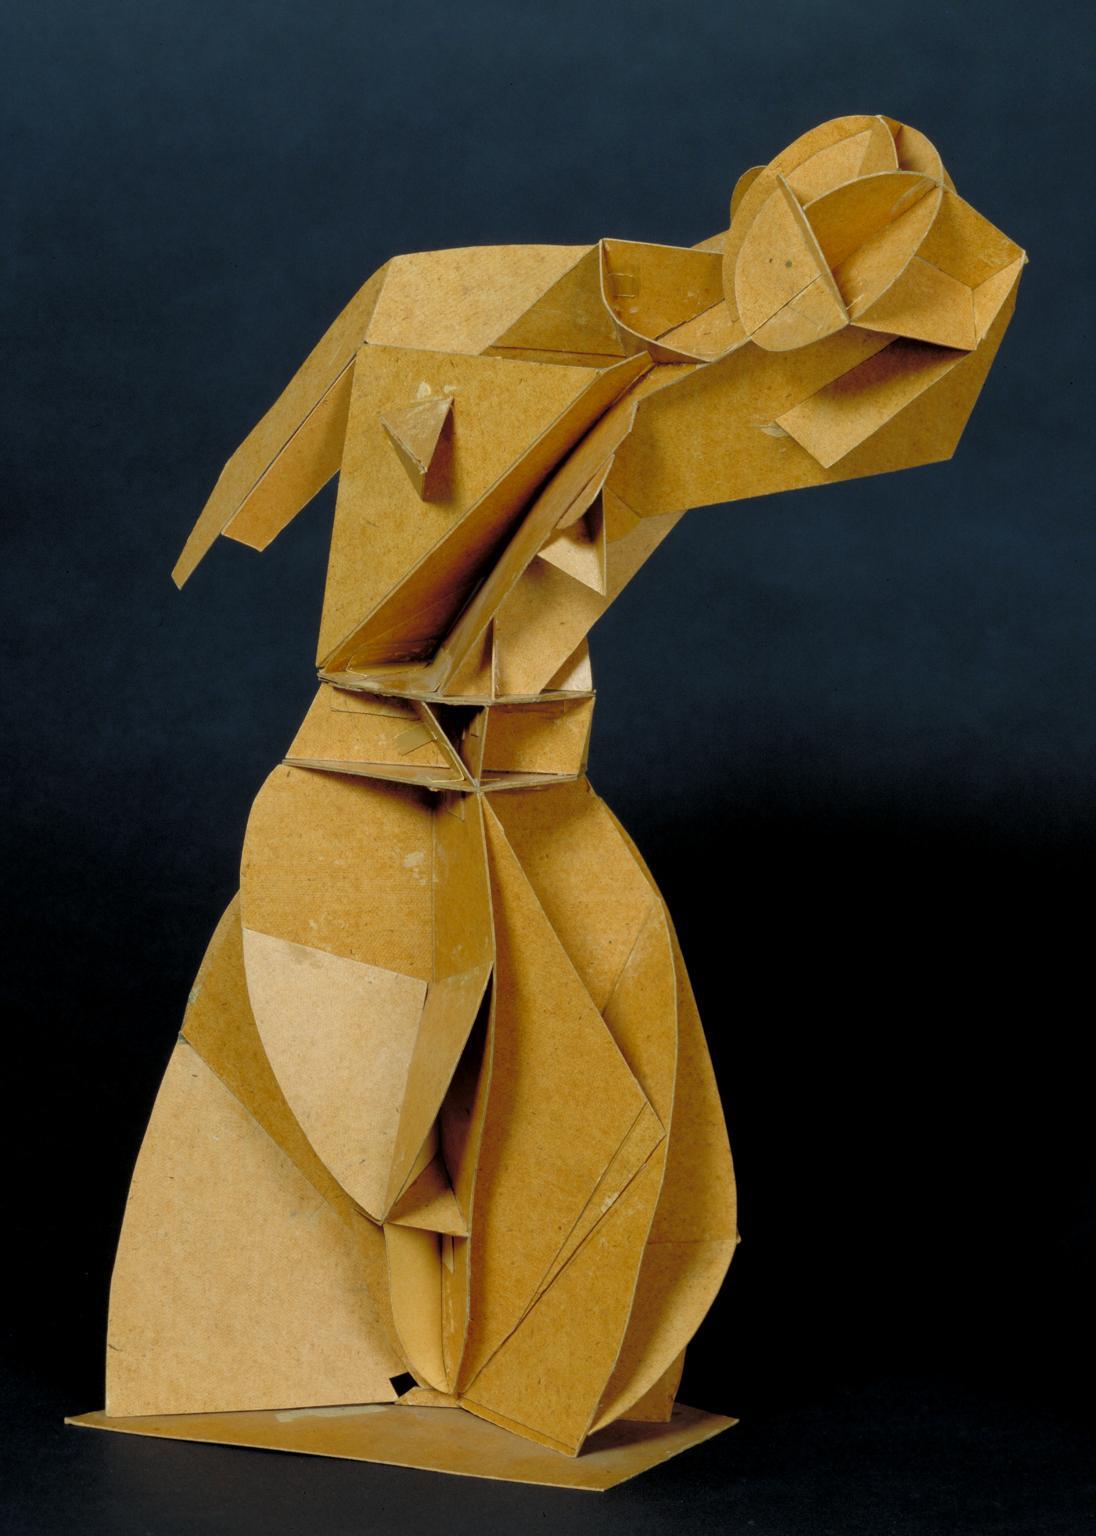 Naum Gabo, Model for 'Constructed Torso', 1917.